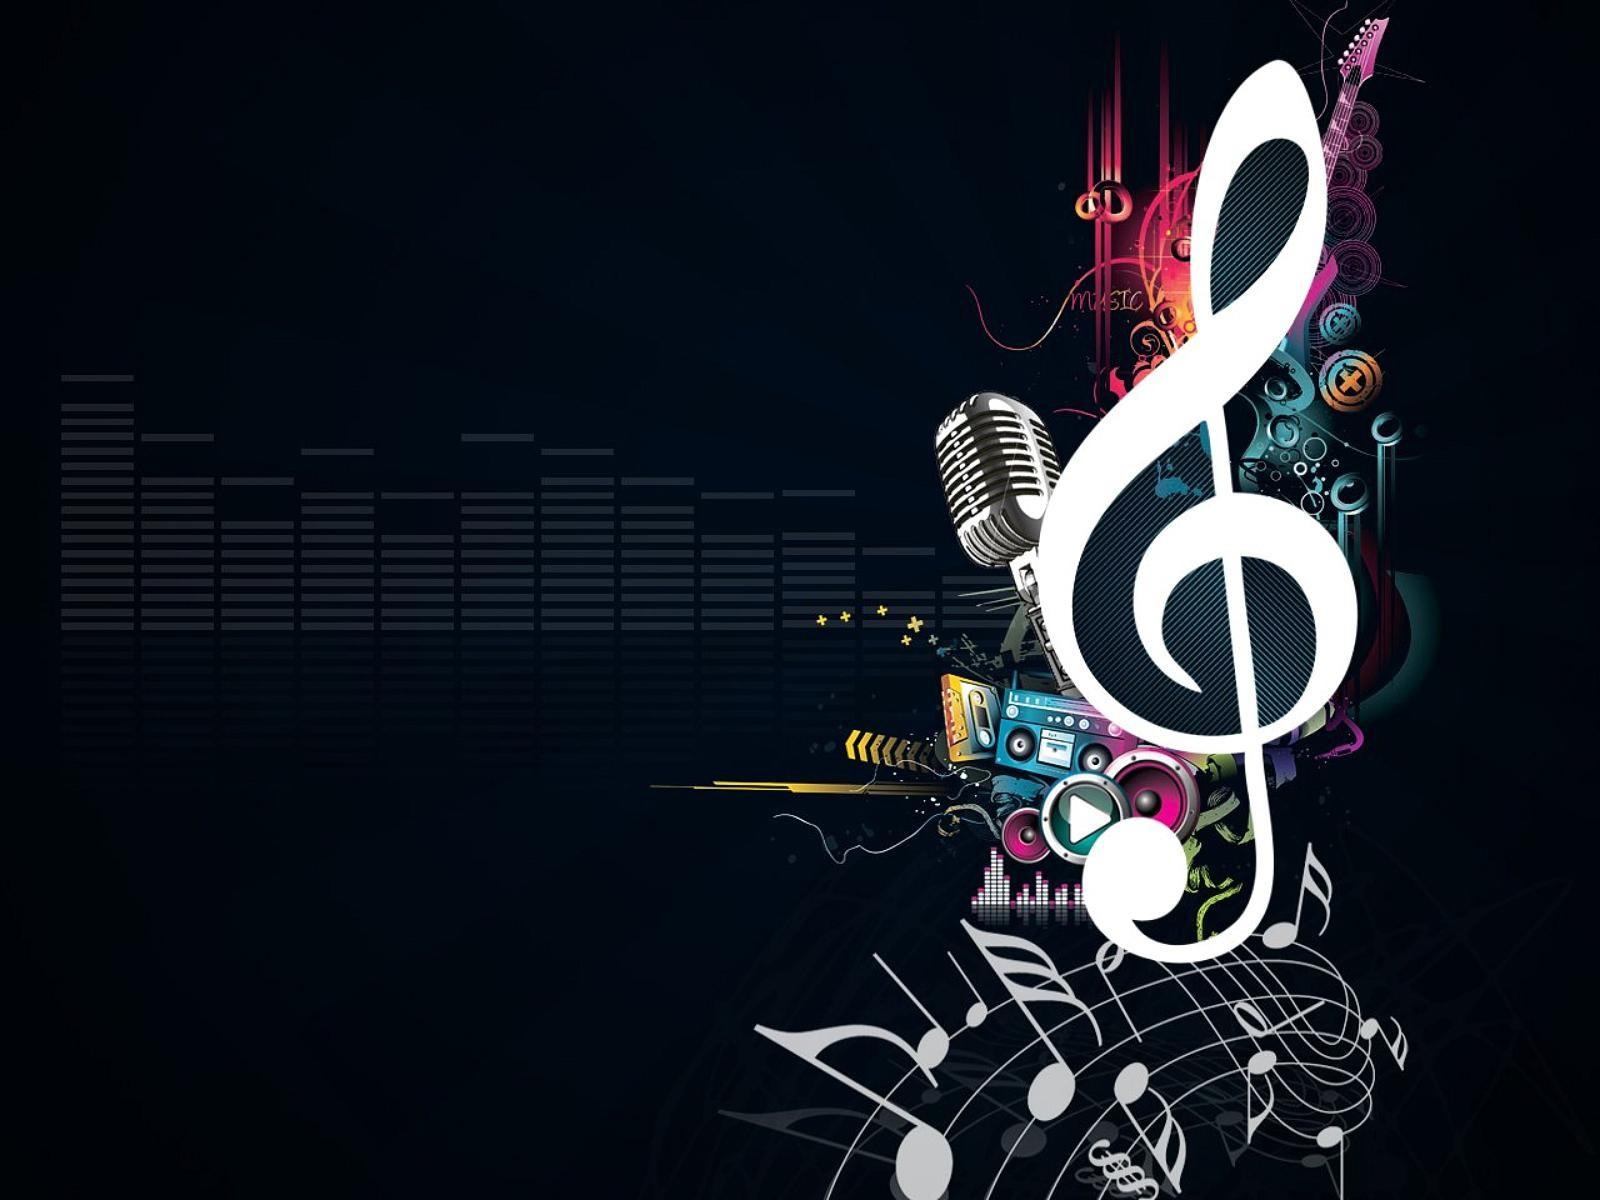 music   Anime Music and japanese music Wallpaper 35648057 1600x1200